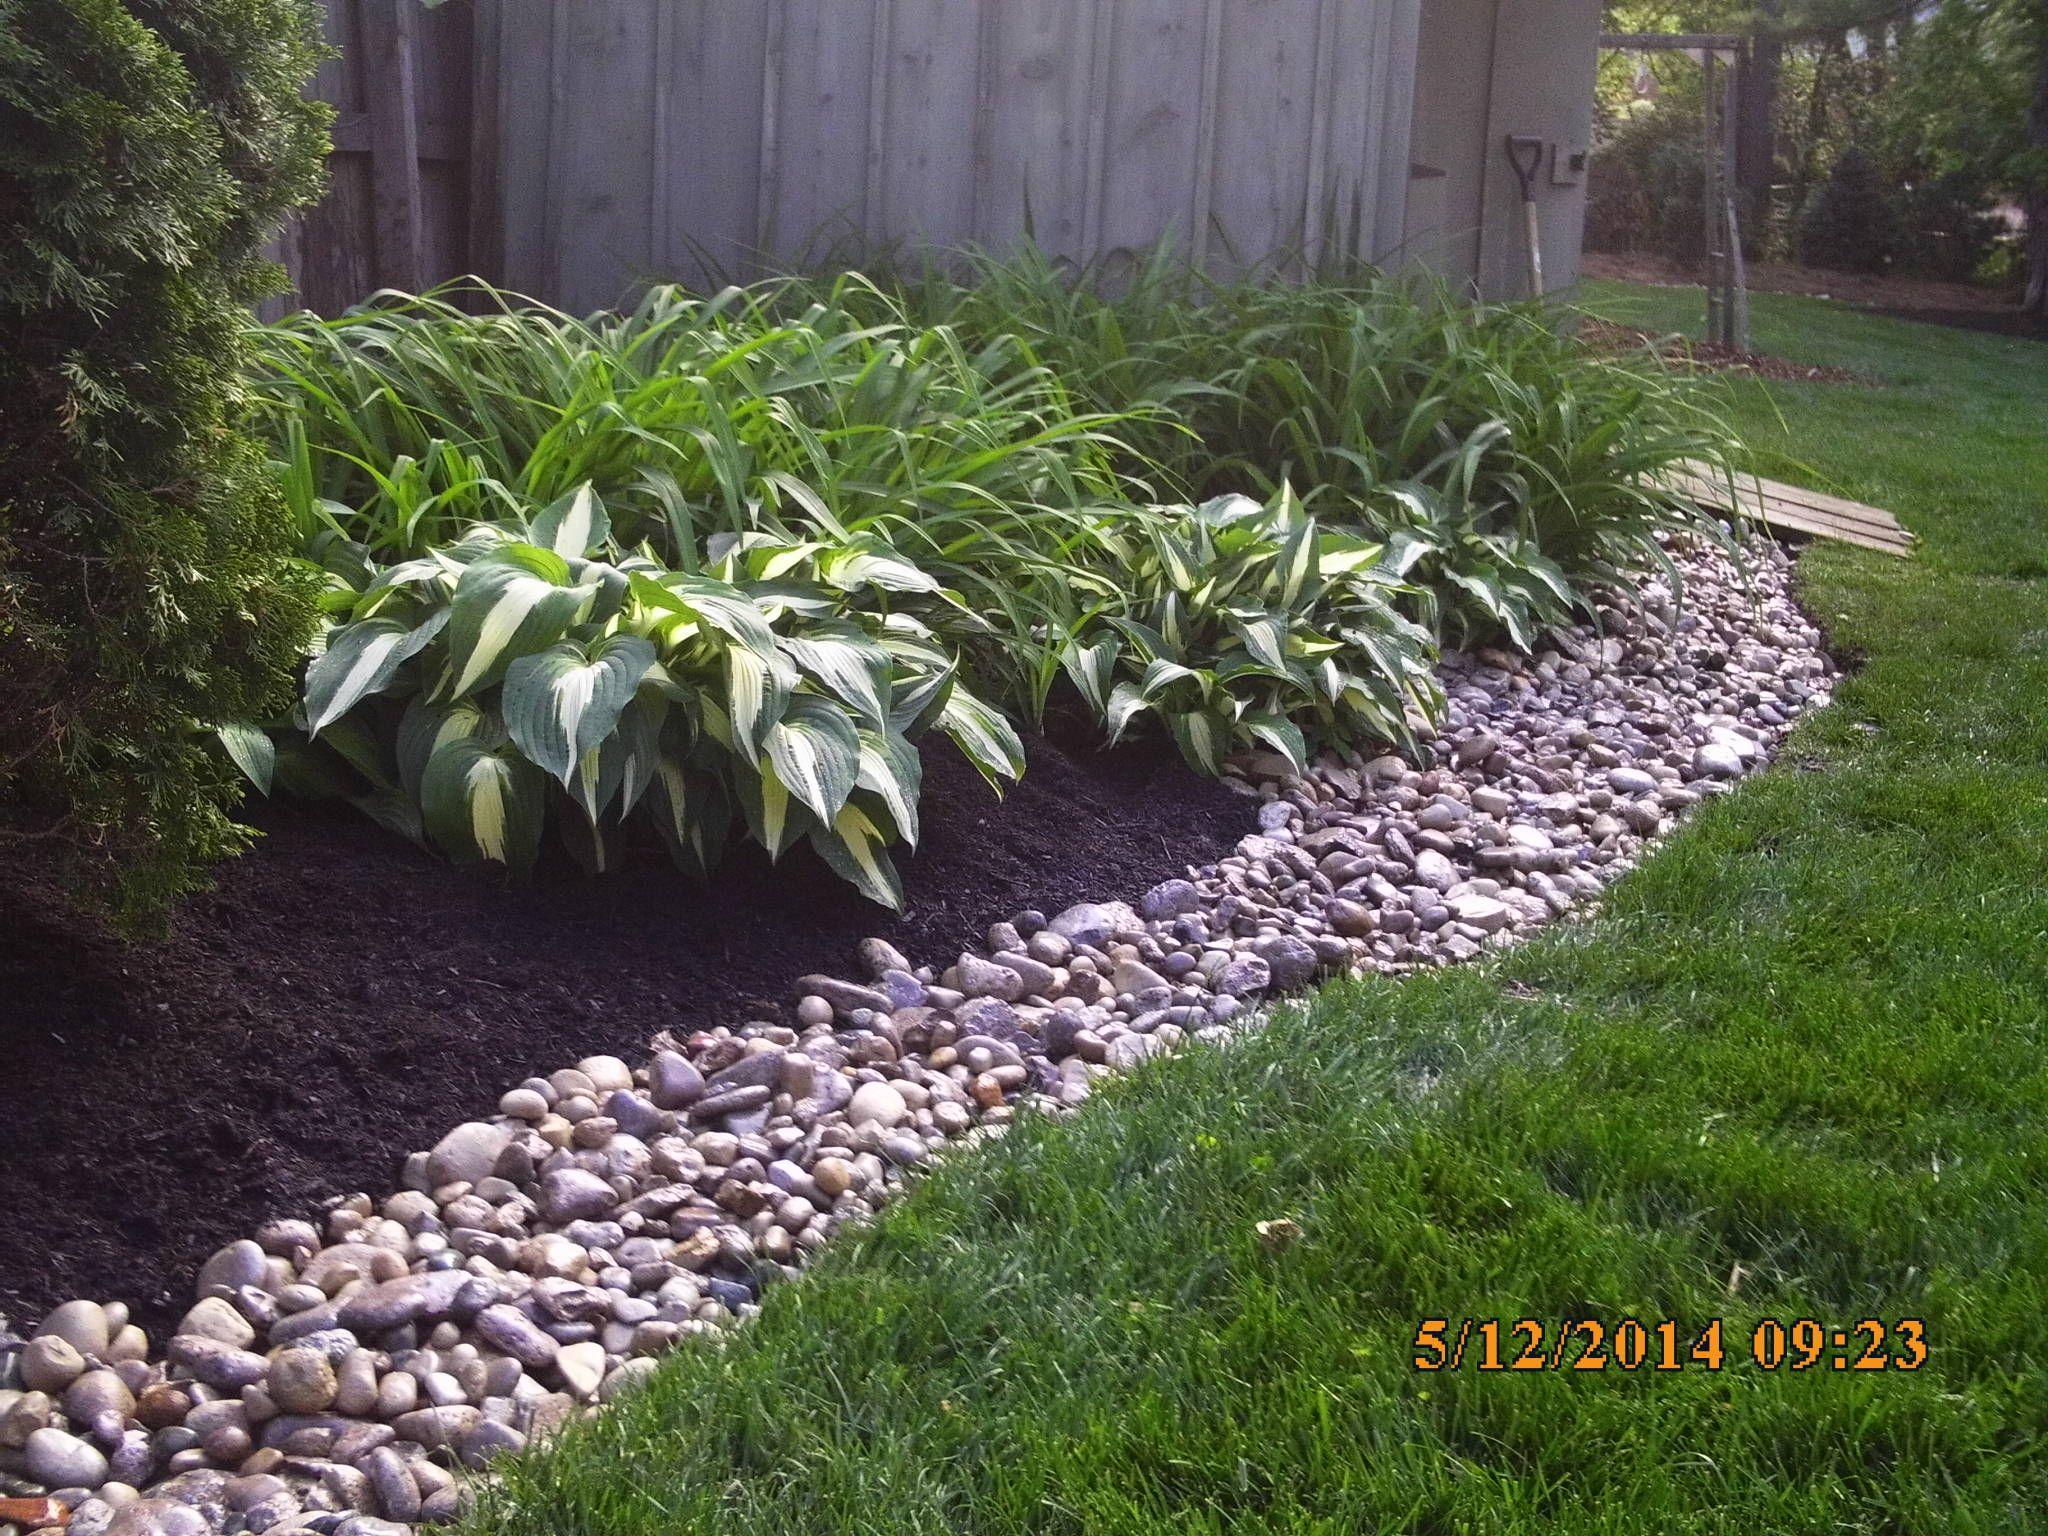 Landscape Job 16 Mulch Bed w/ River Rock Bank Spring